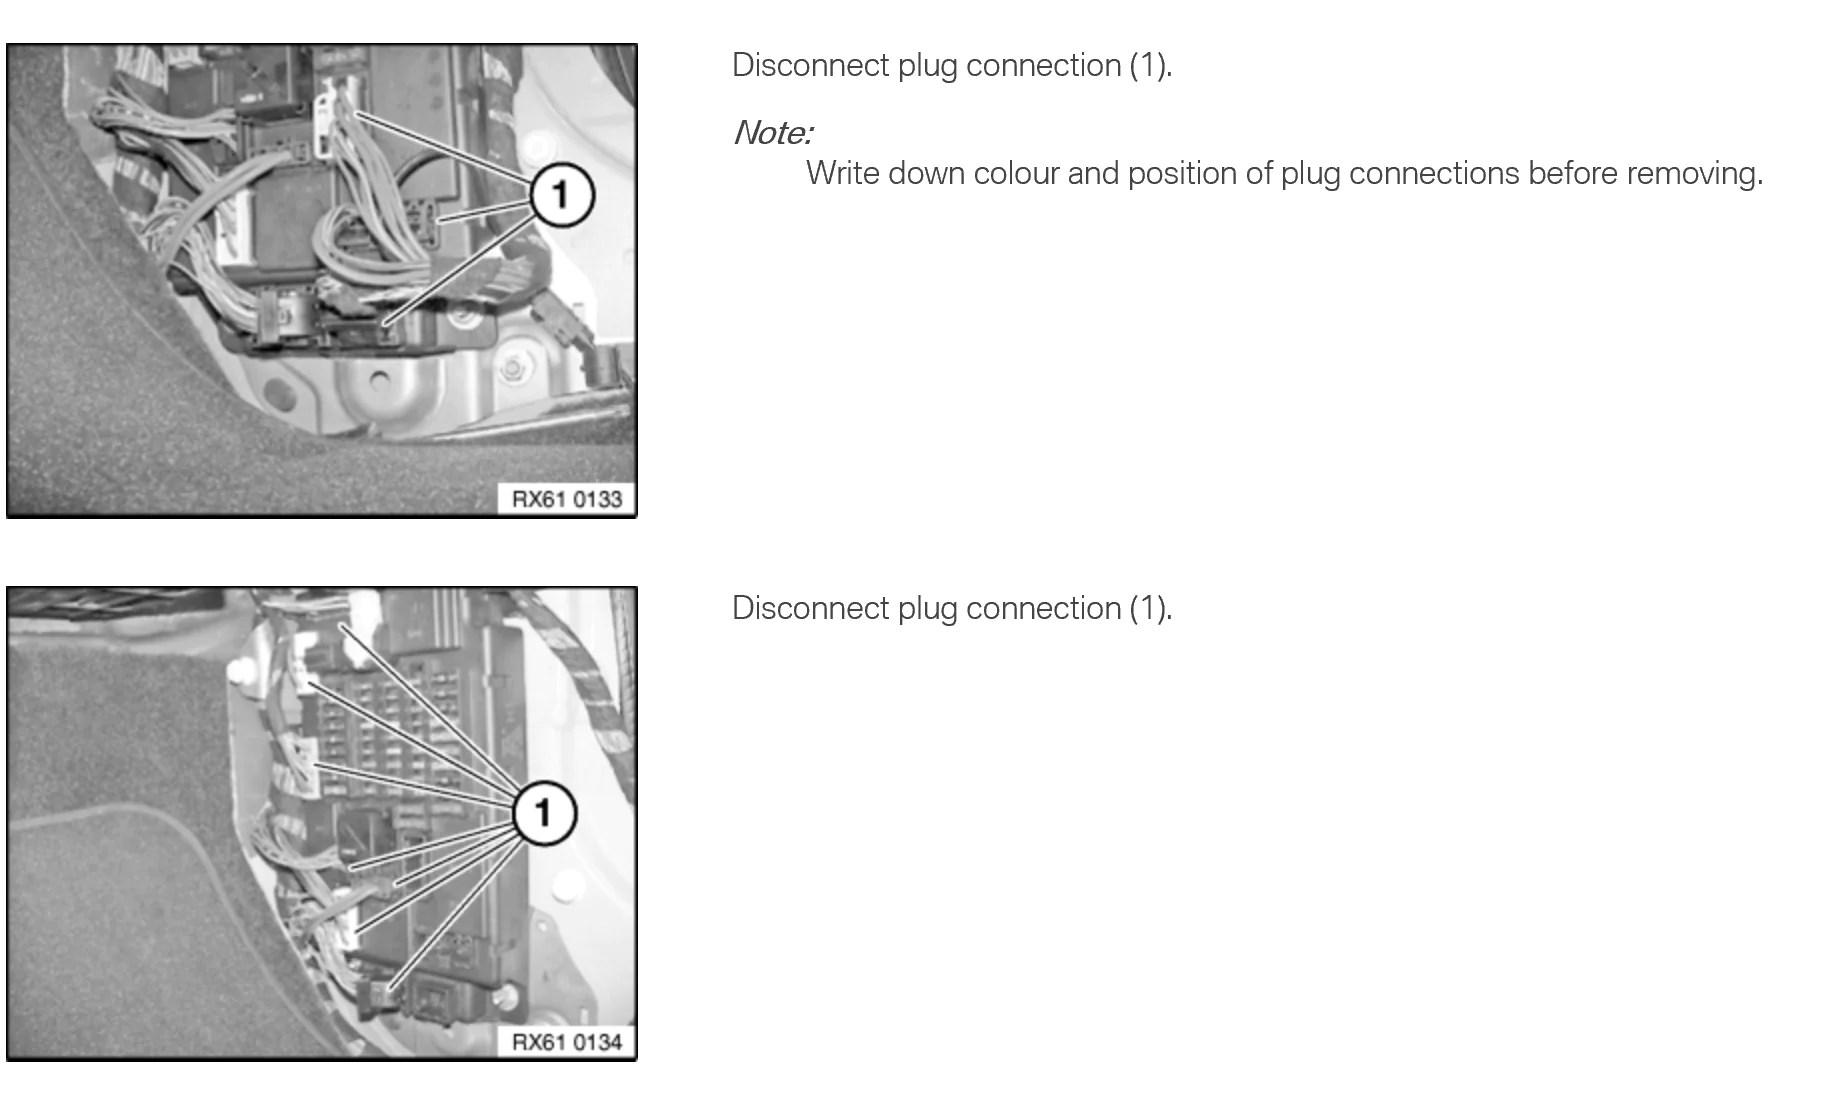 hight resolution of mini cooper r56 r58 r60 all r series fuse box speg removalmini cooper r56